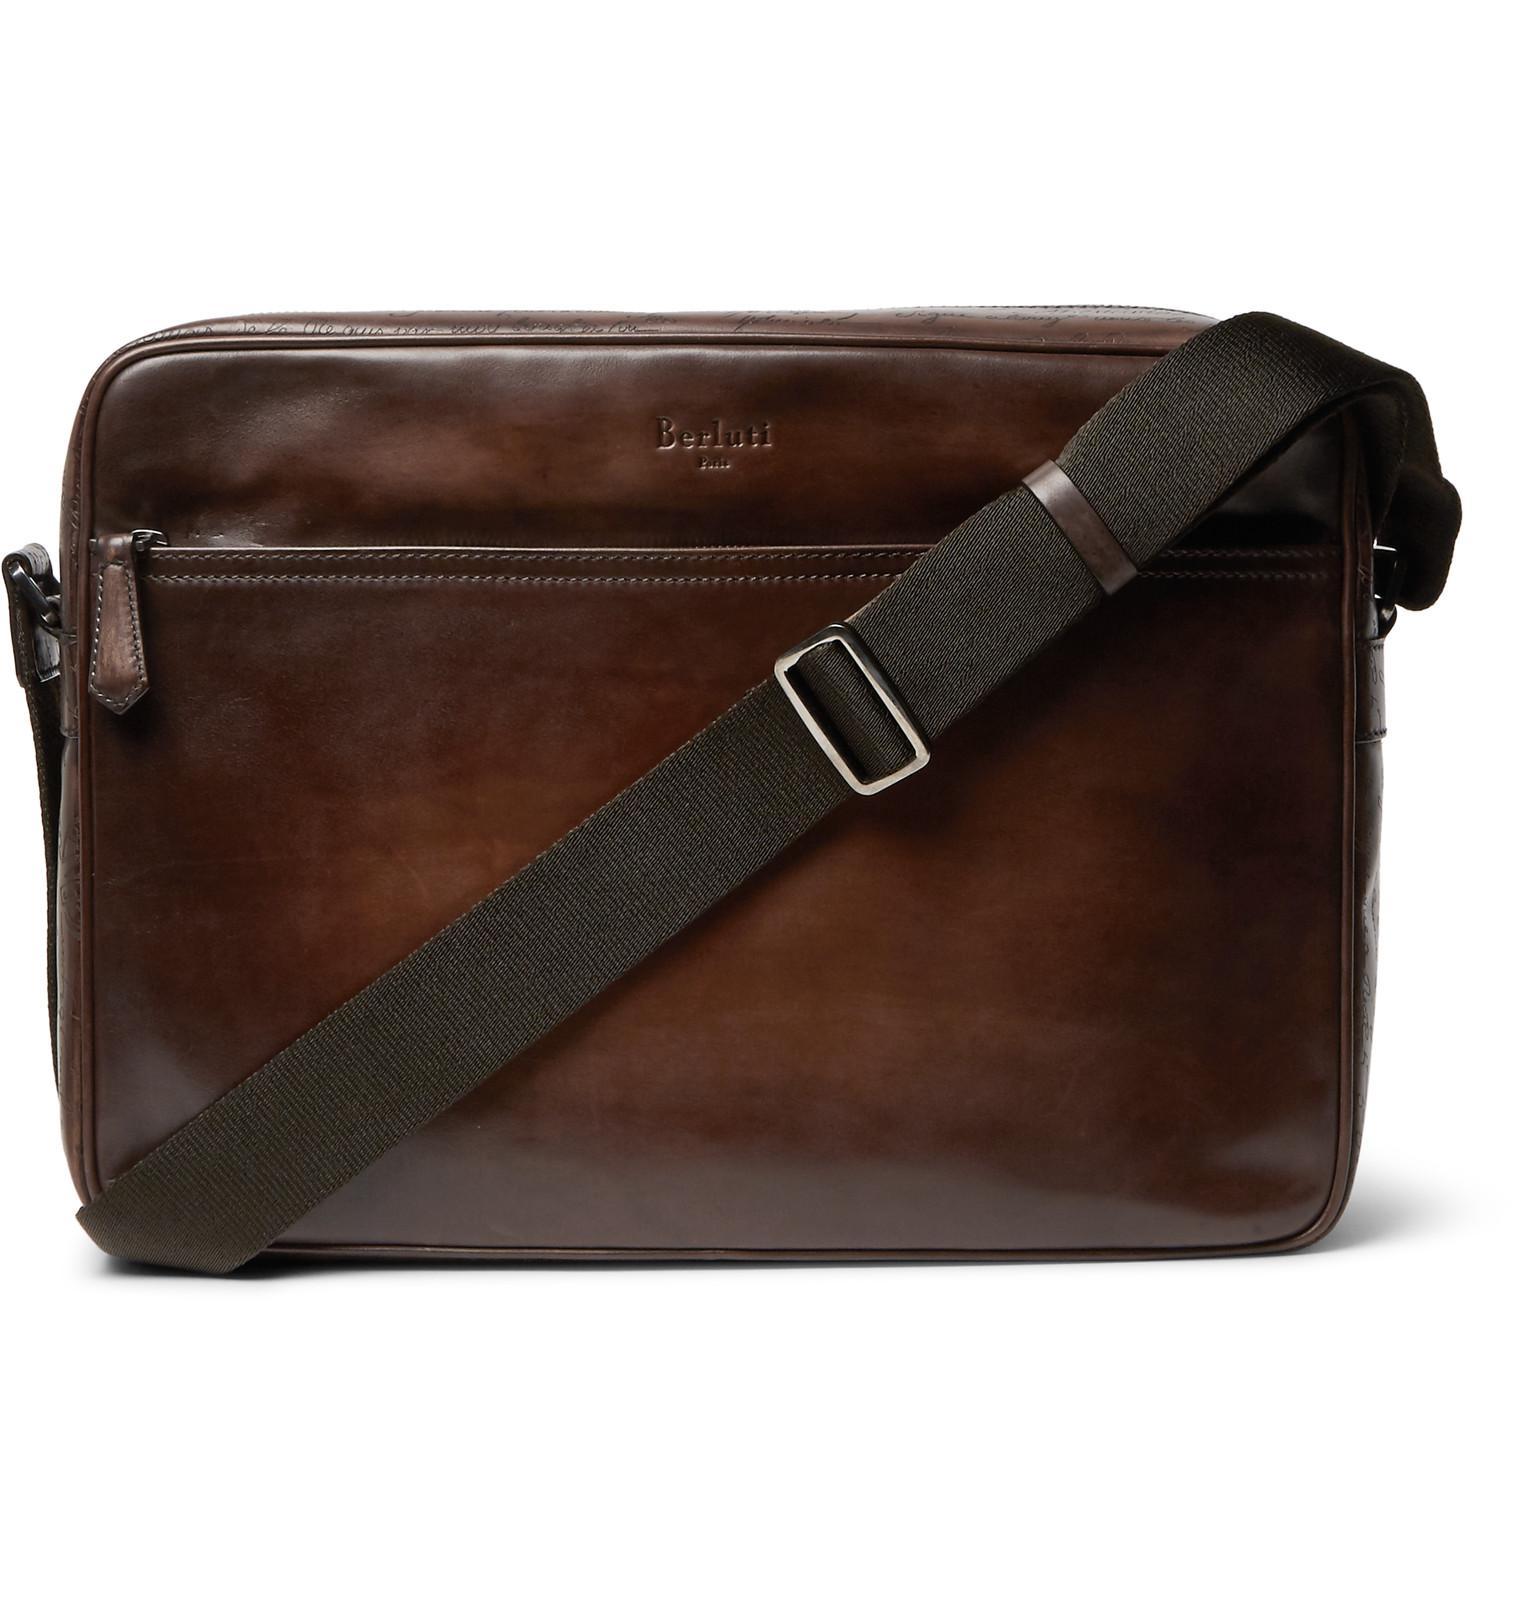 Monolithe Medium Leather Messenger Bag Berluti 2QHEG